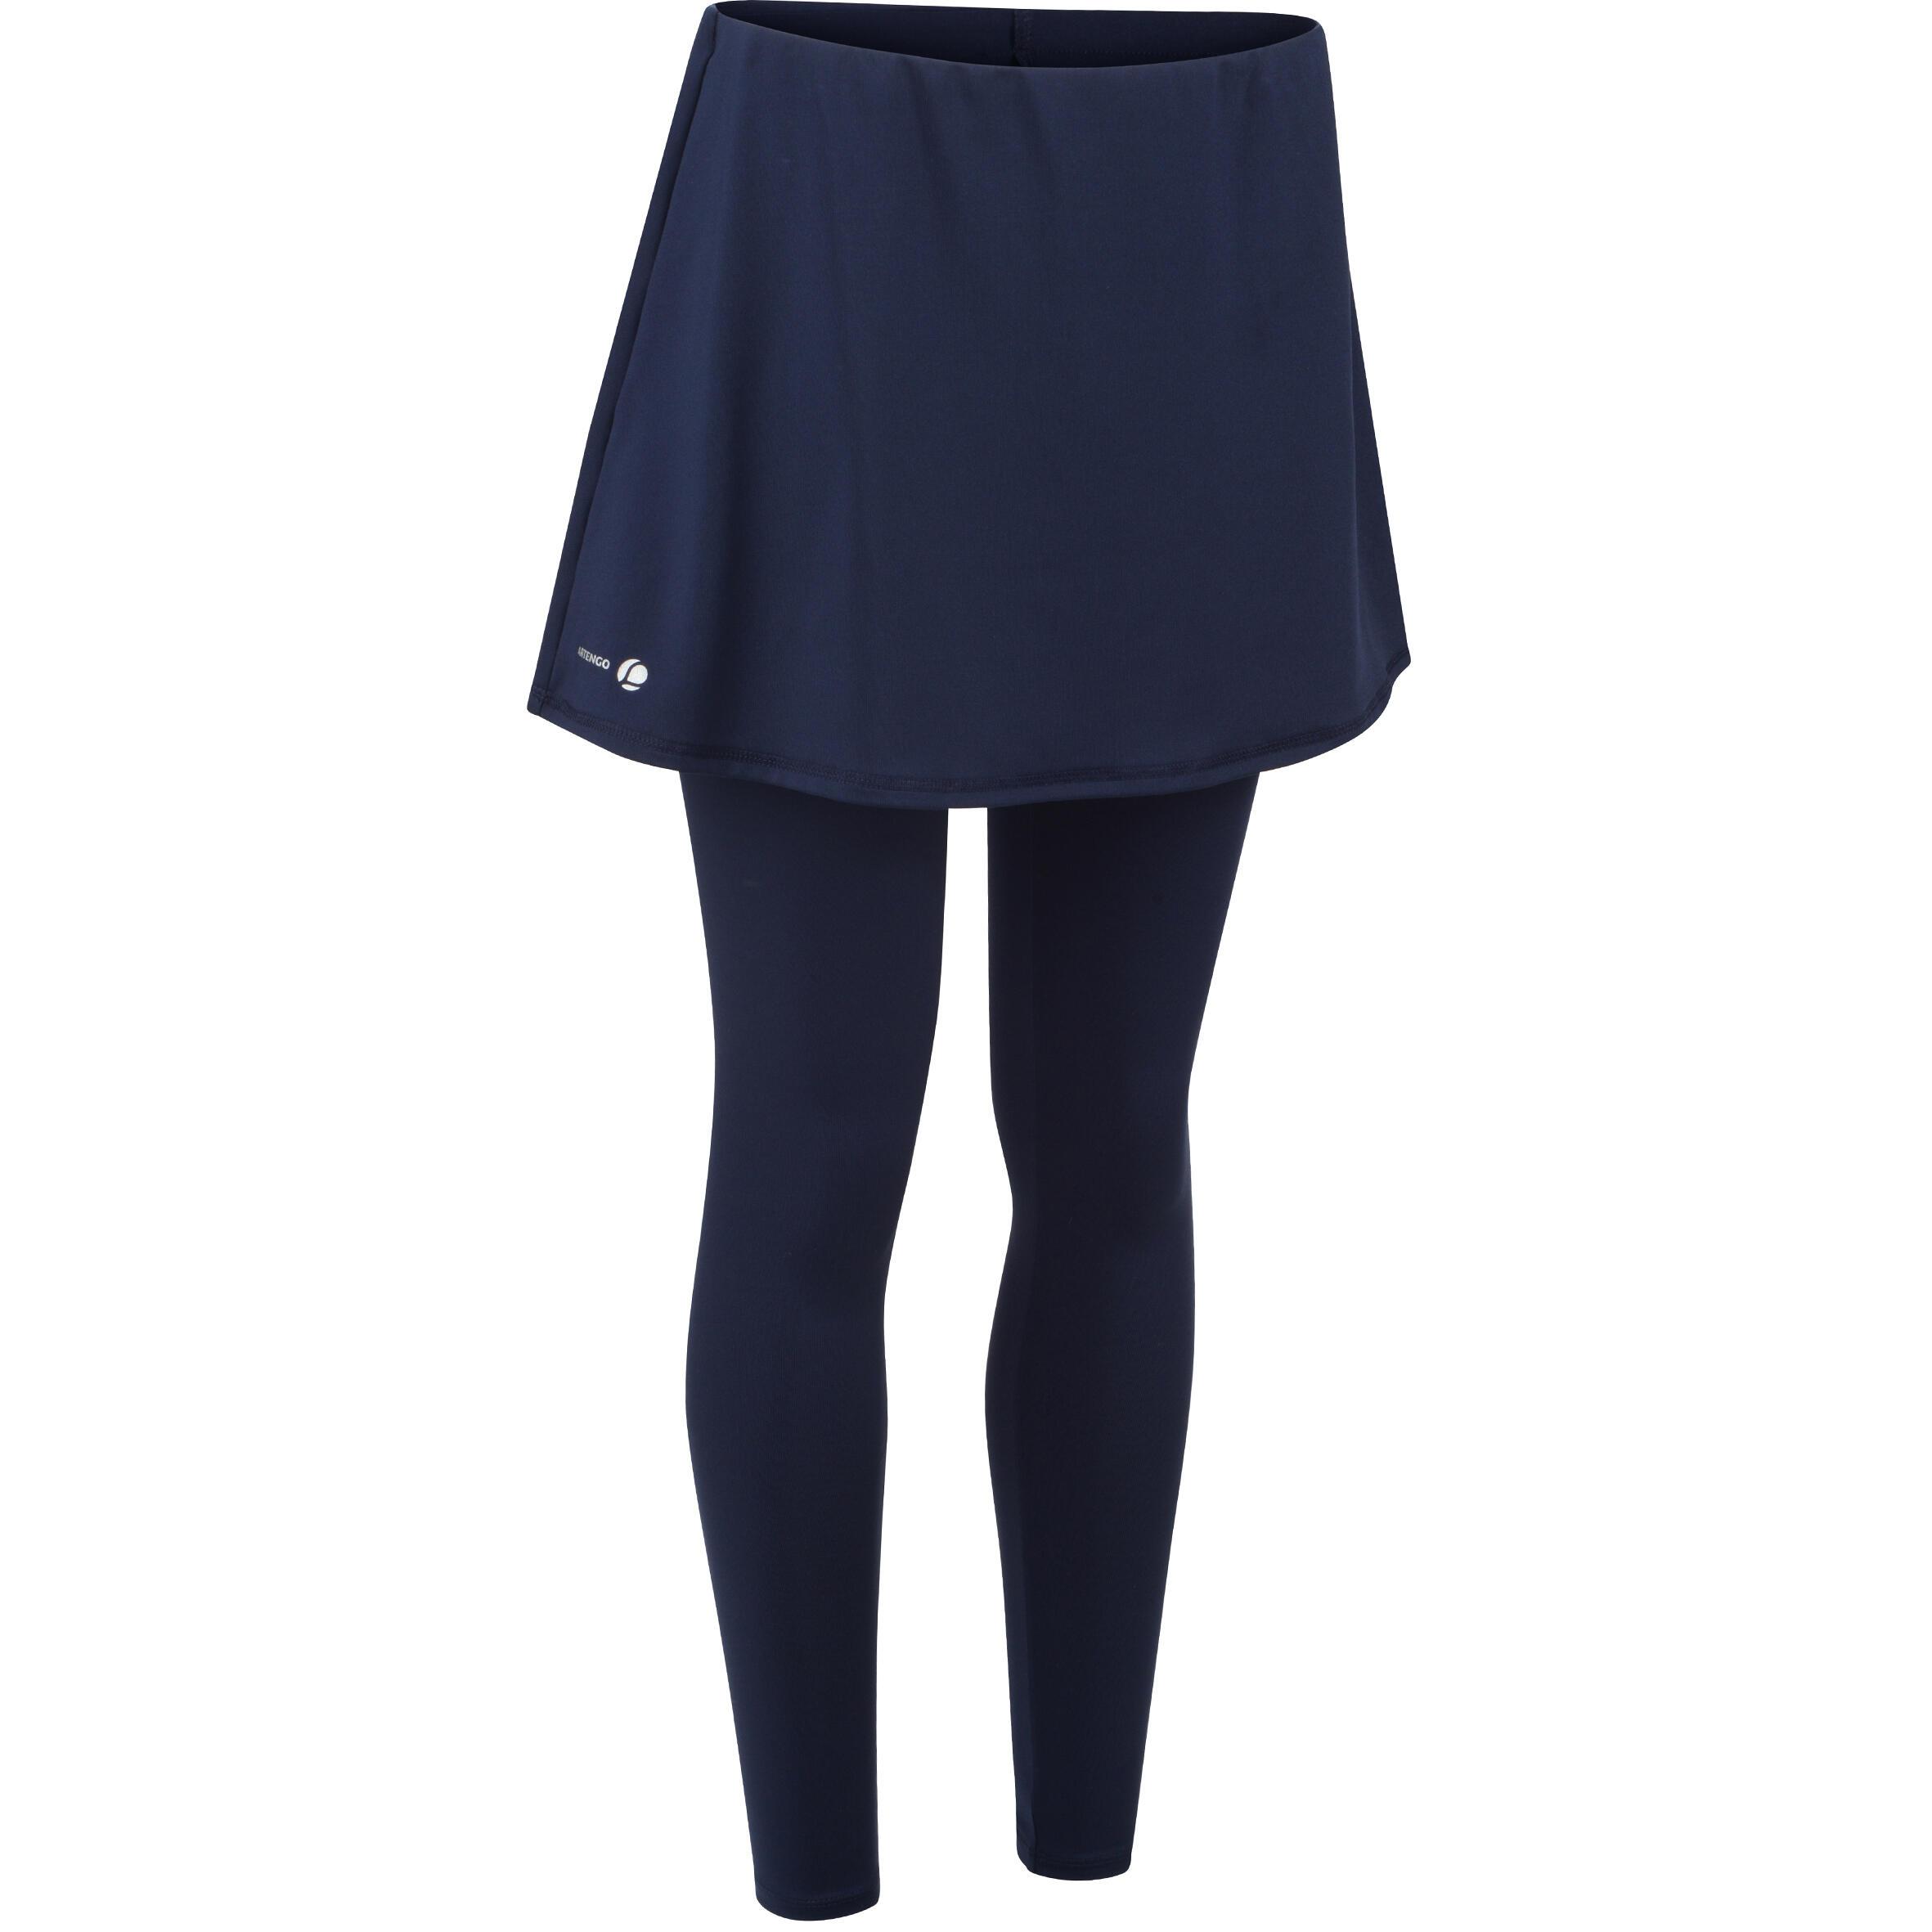 Tennisrock 500 warm Damen marineblau | Sportbekleidung > Sportröcke > Tennisröcke | Artengo